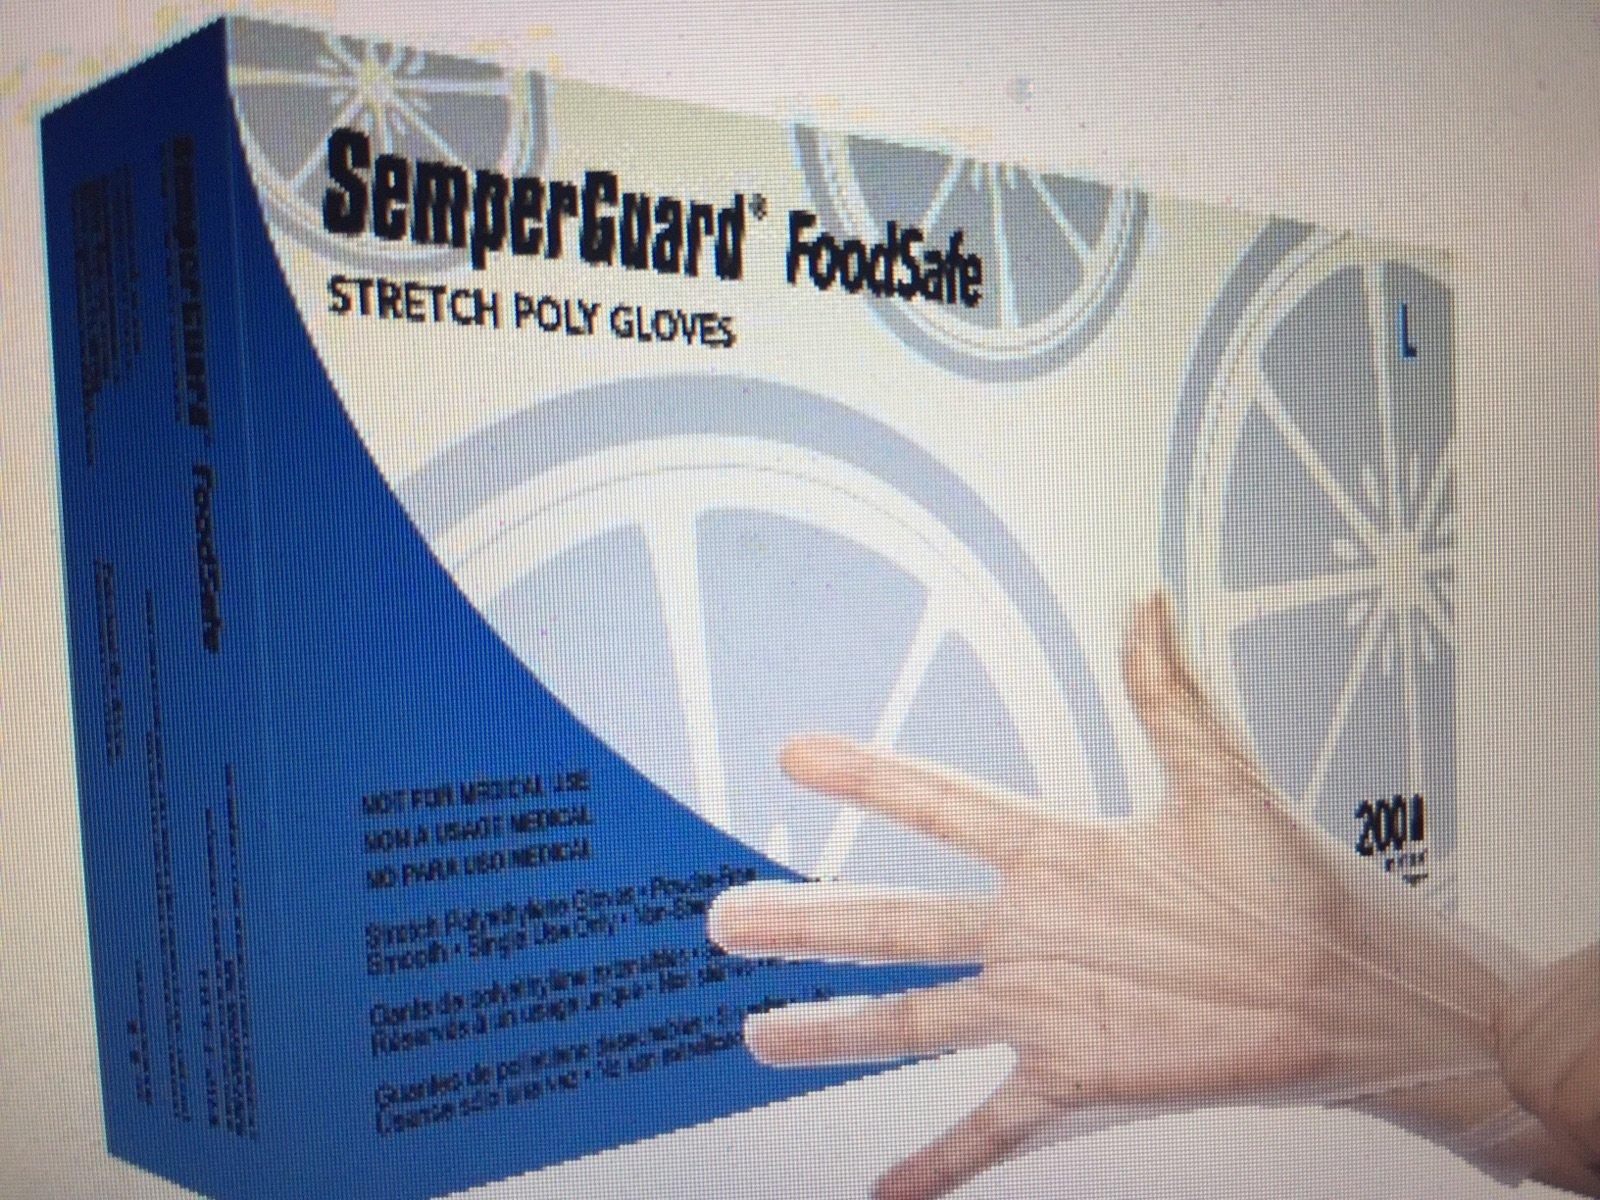 SemperGuard Food Safe Stretch Poly Gloves (10 boxes of 200) - LARGE